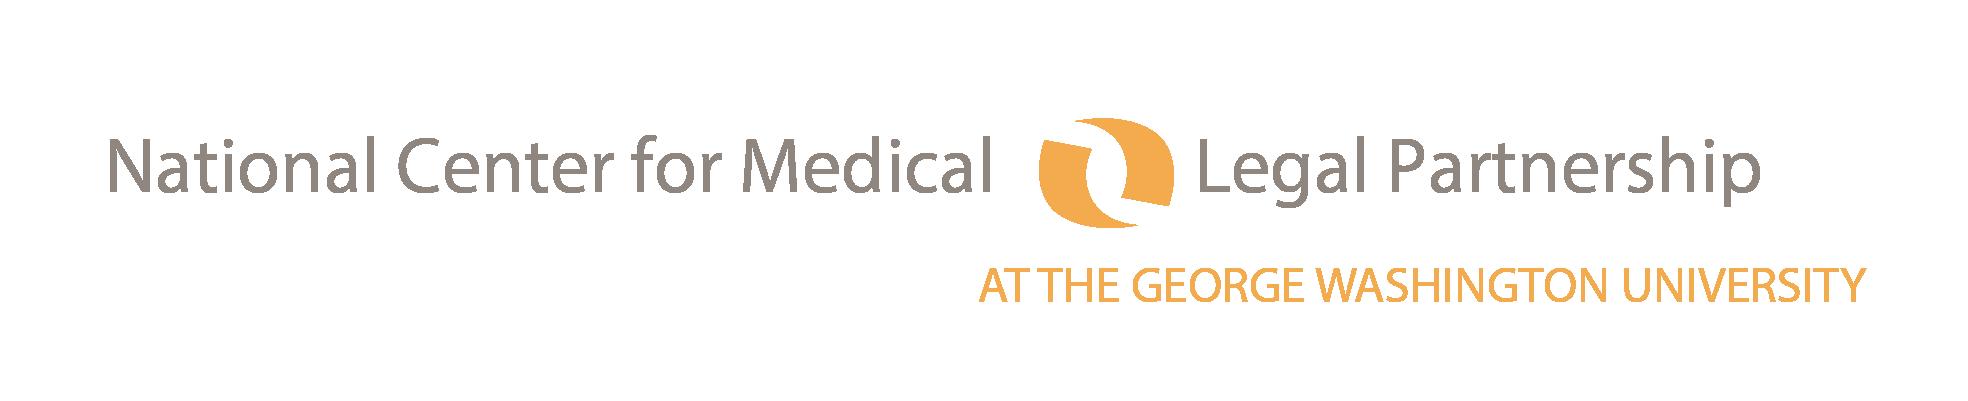 National Center for Medical-Legal Partnership logo